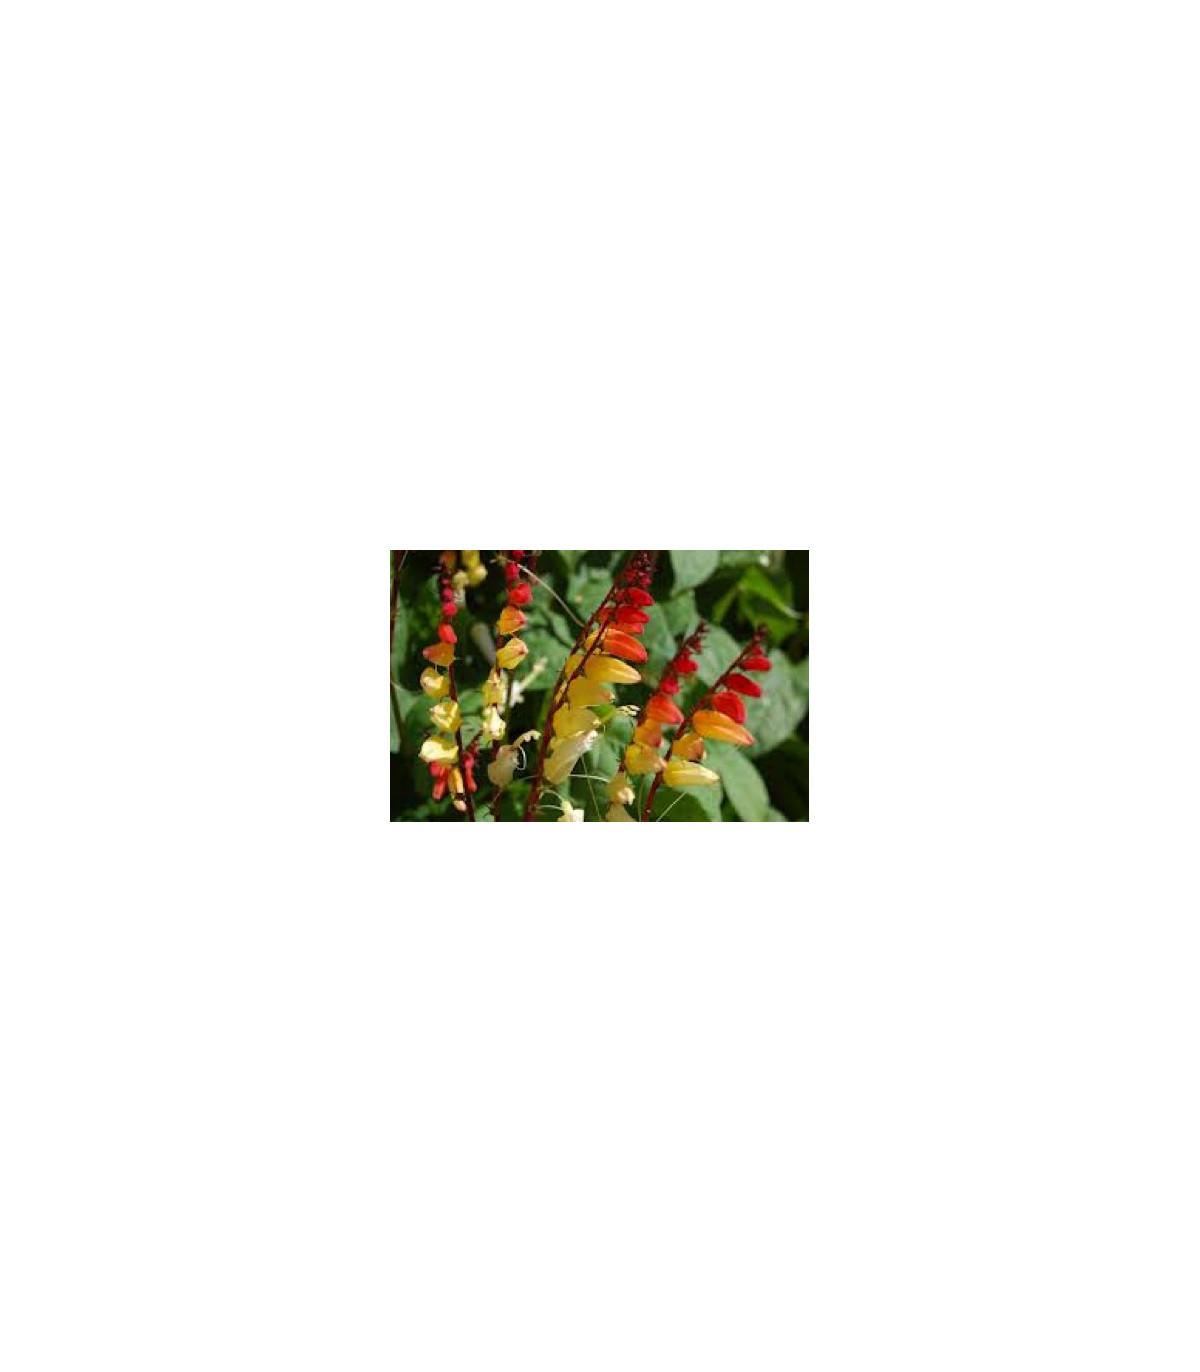 Mina laločná - kvamoklit - Quamoclit lobata - semená miny - semiačka - 20 ks